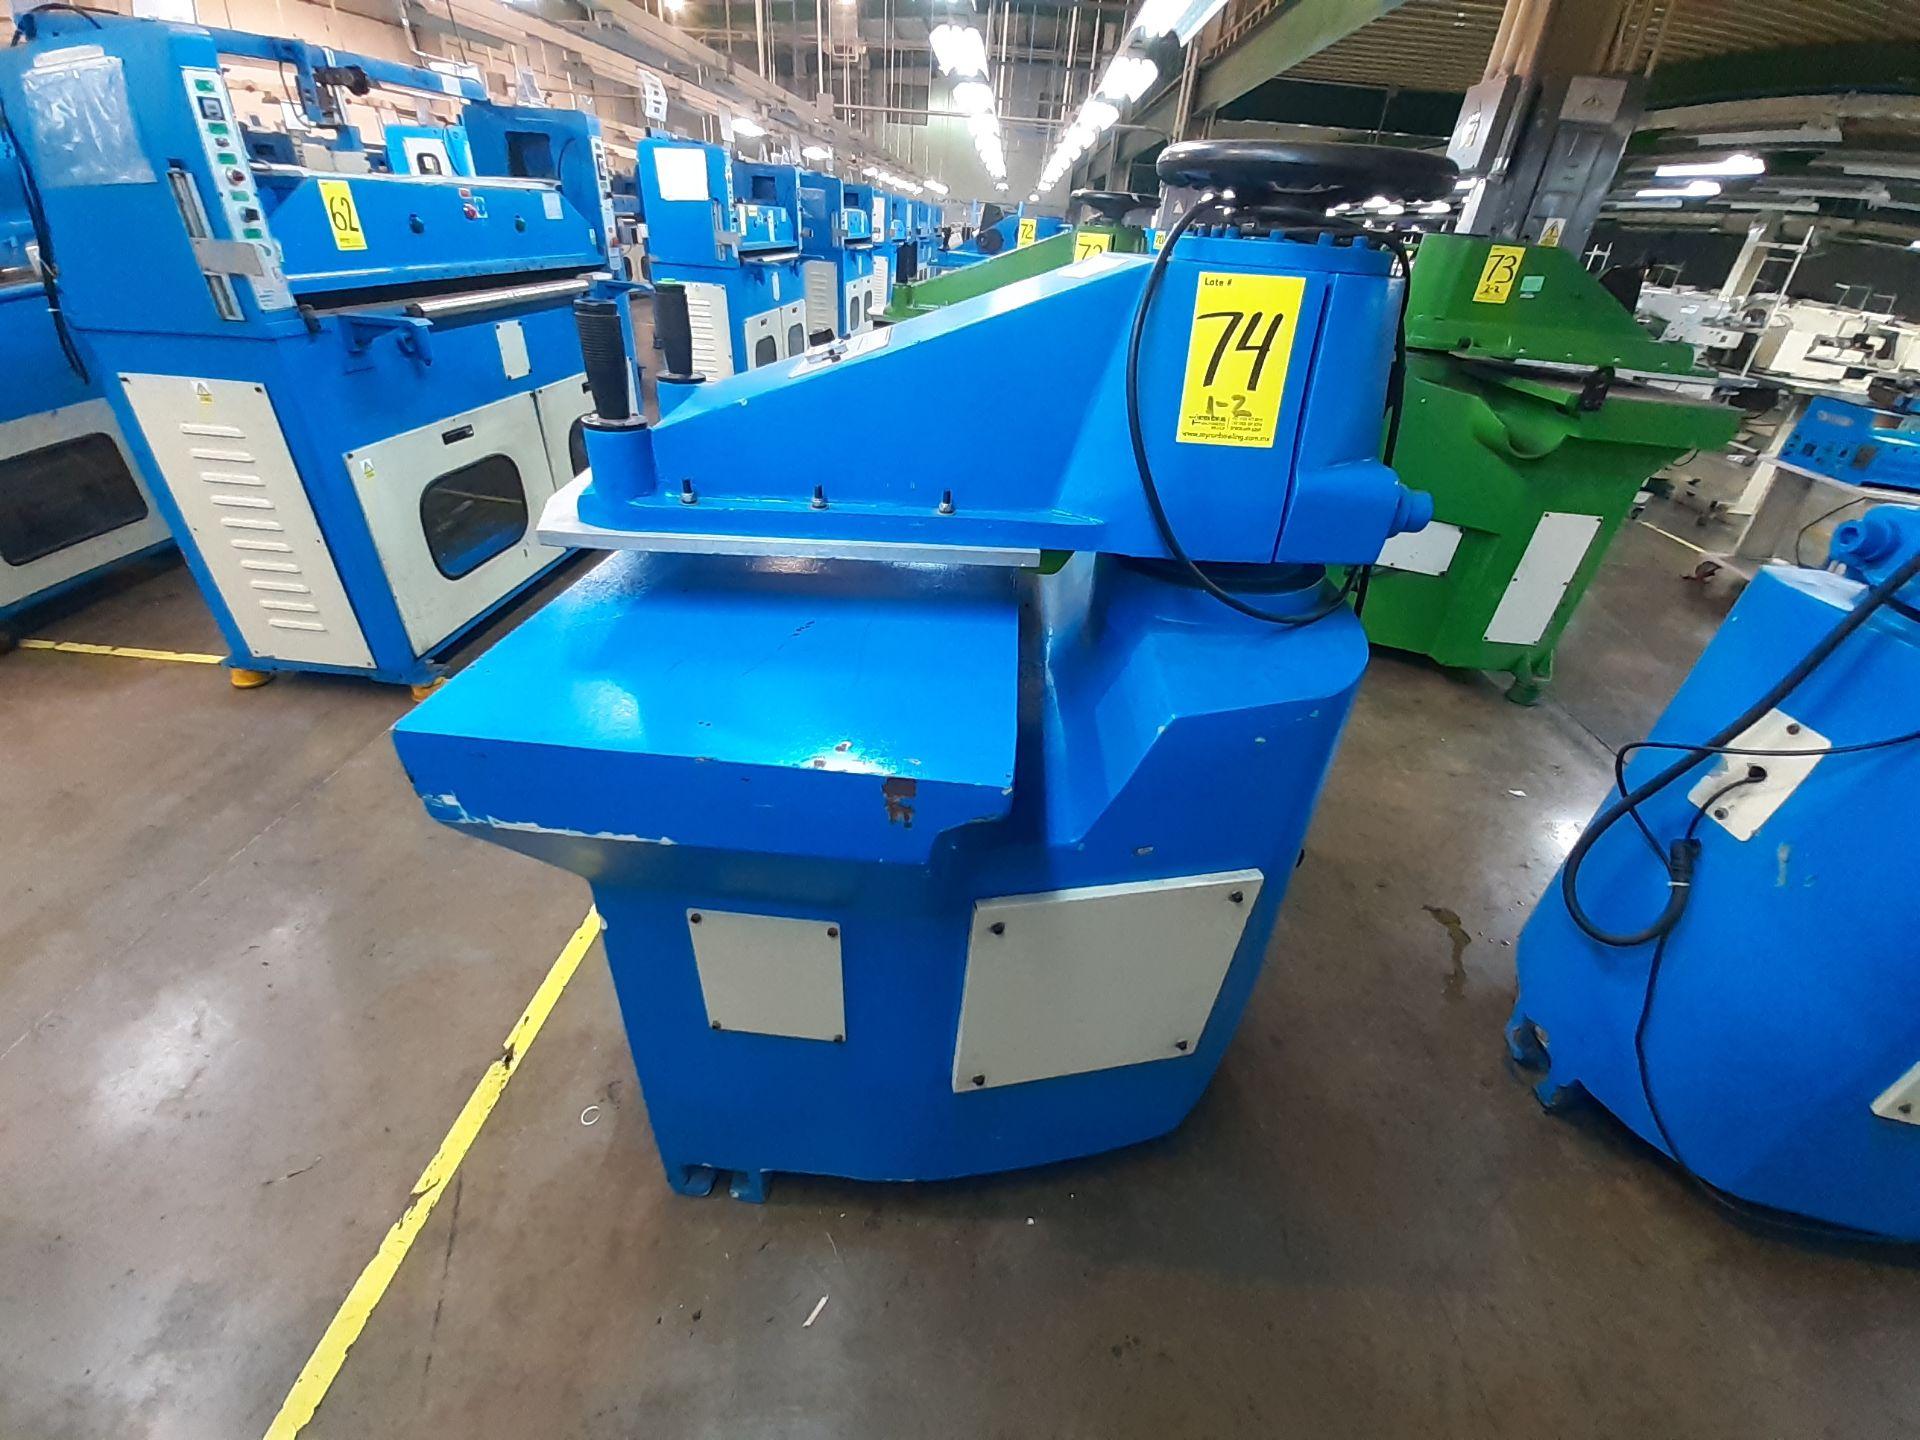 (2) Prensas de corte hidráulica de brazo oscilante, marca Dong guan Dah Dine Machine, Modelo: DJ-103 - Image 2 of 17